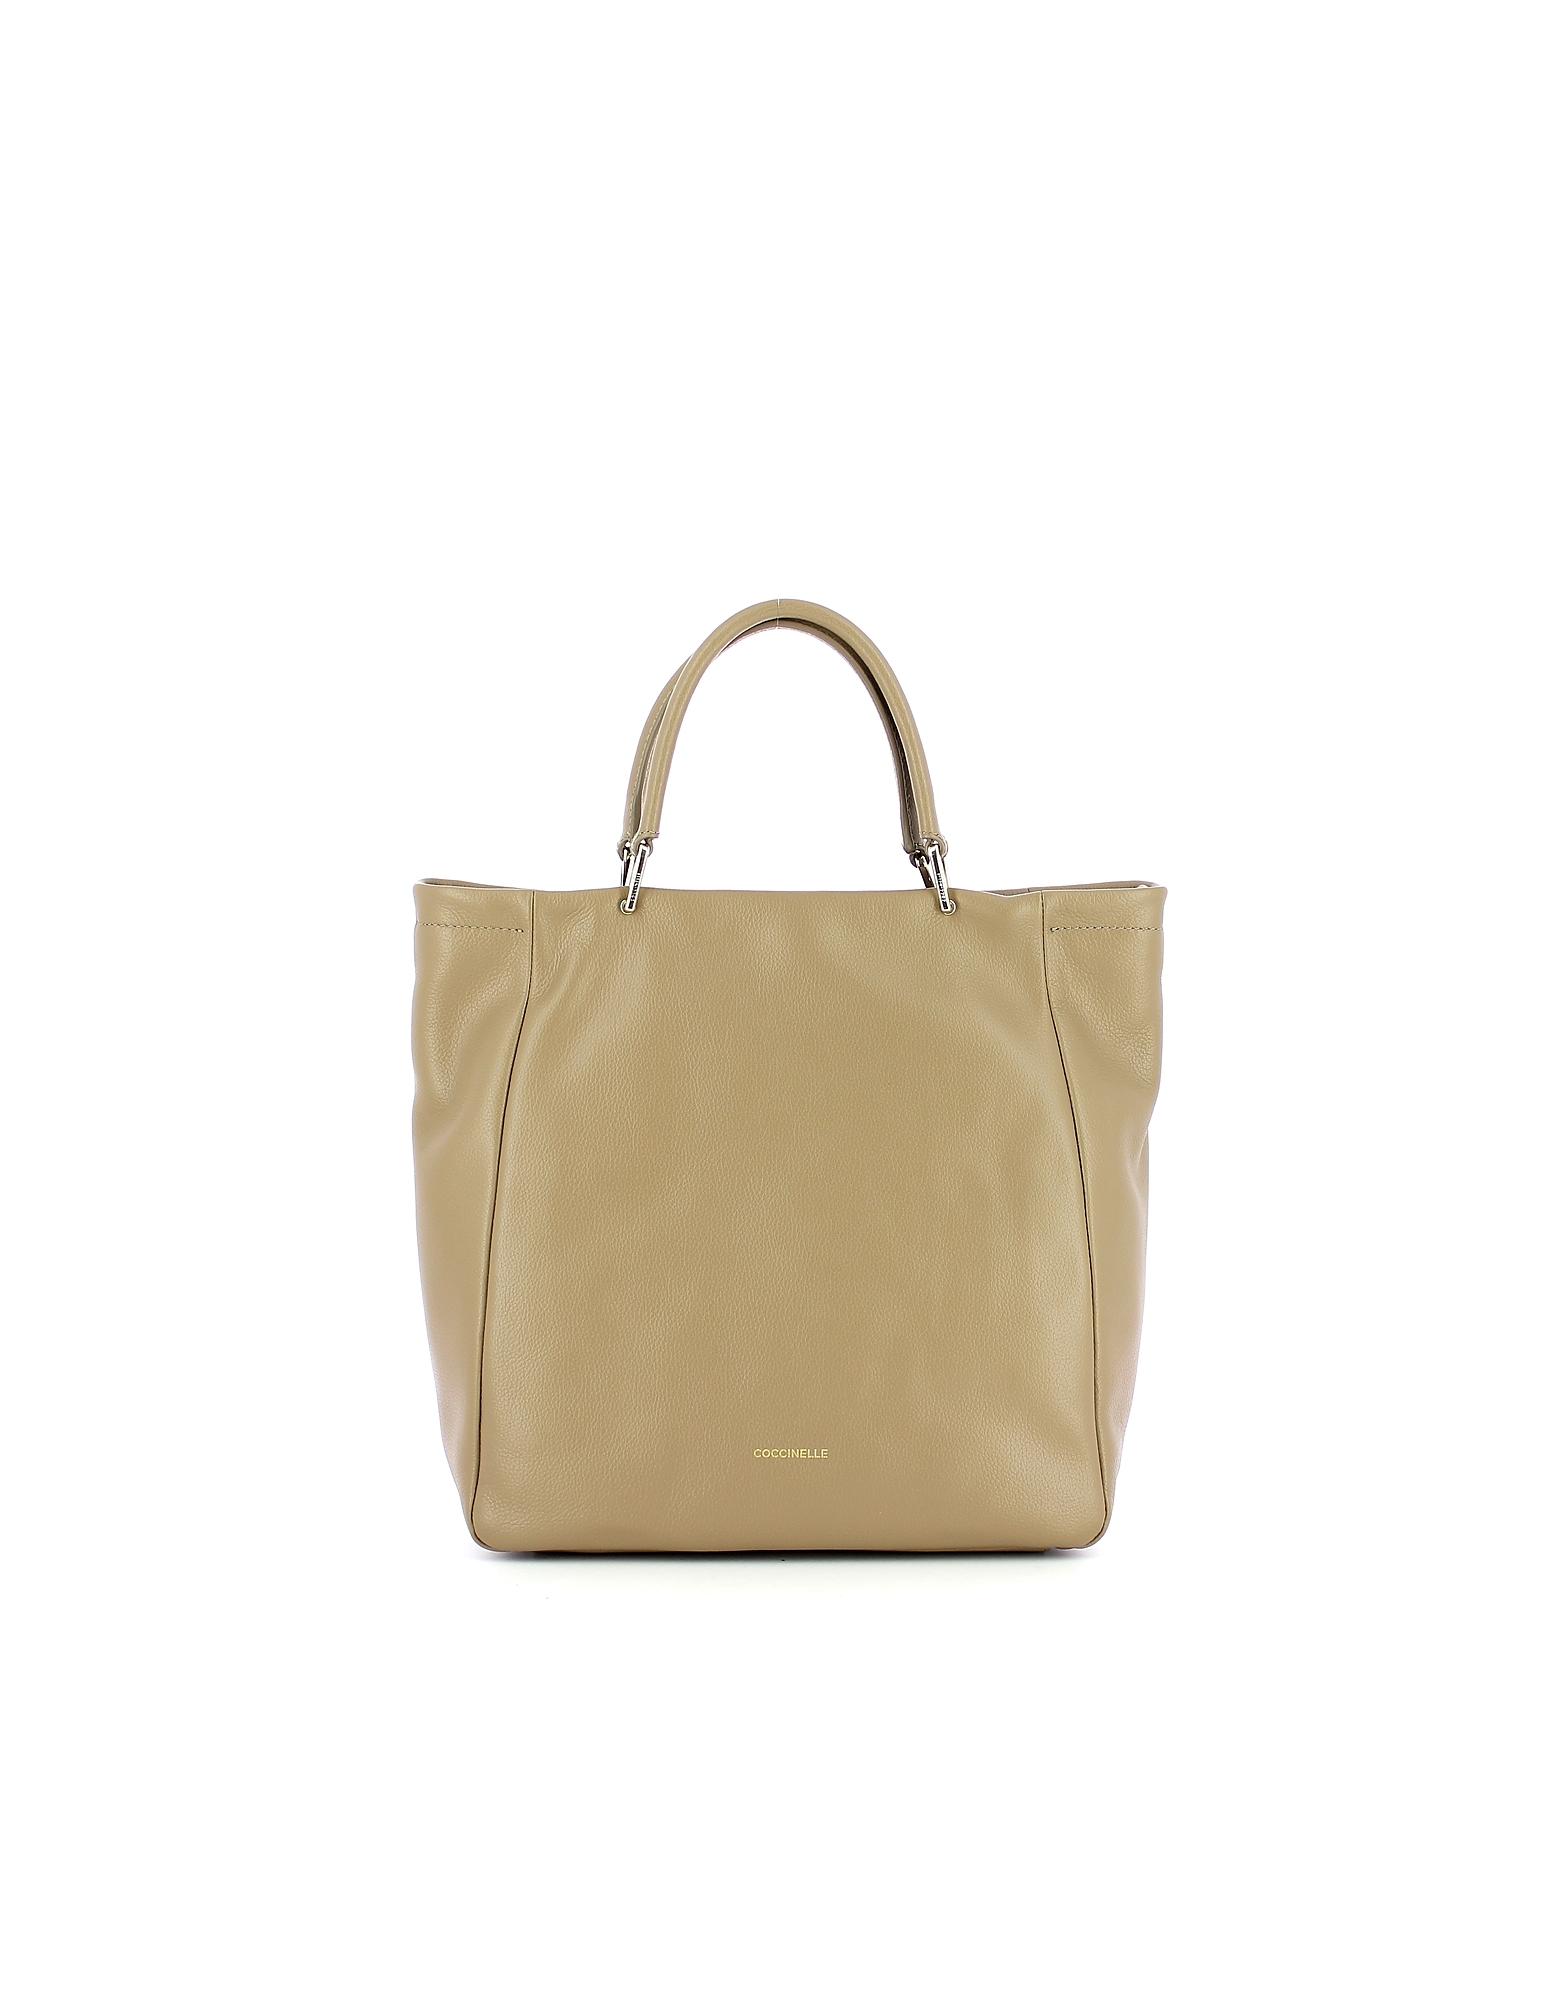 Coccinelle Designer Handbags, Beige Rendez-Vous Tote Bag